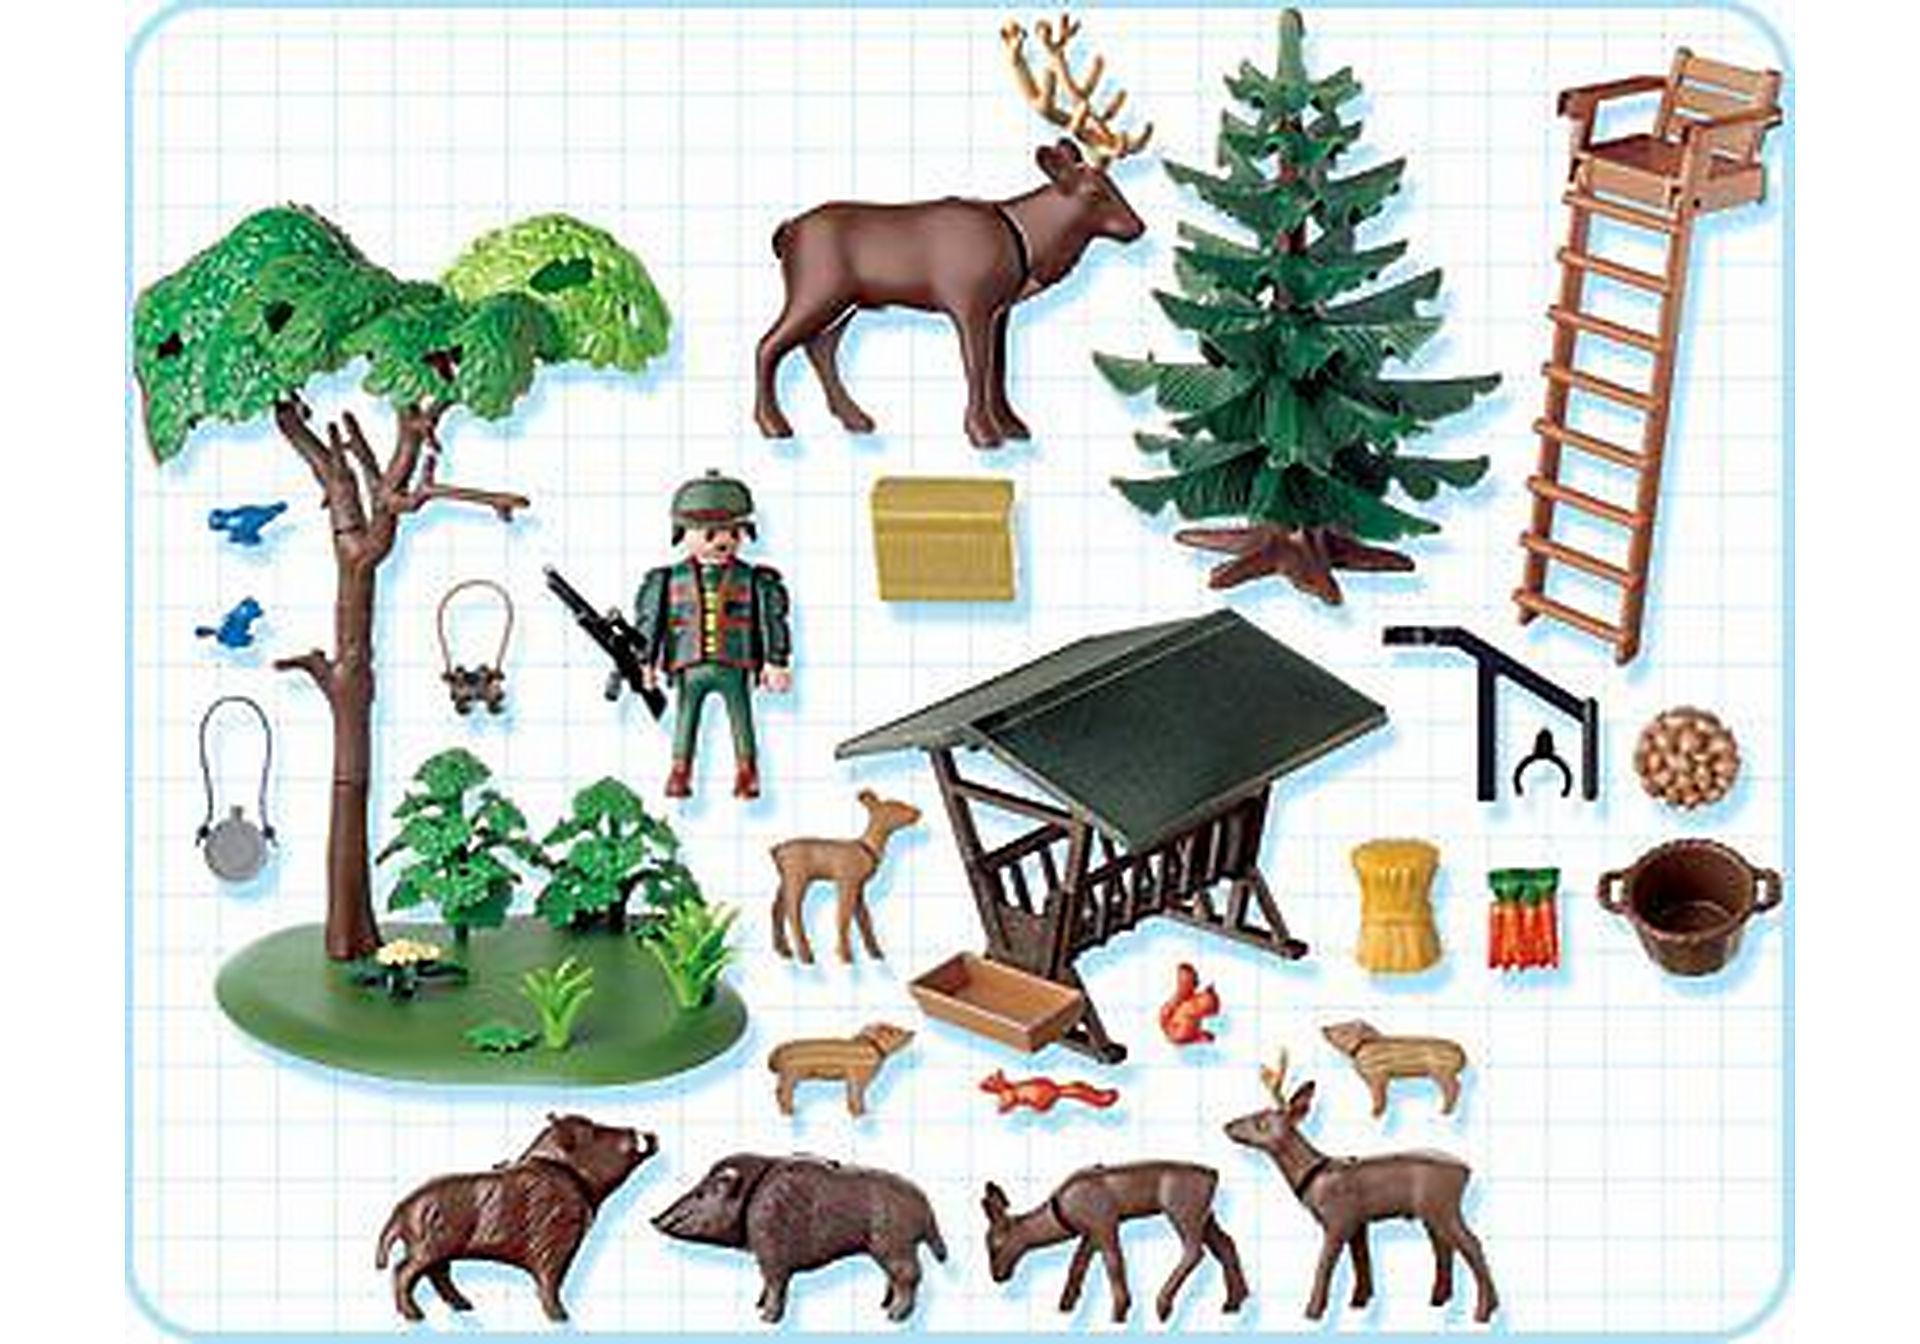 4208-A Garde forestier / animaux / poste de guet zoom image2